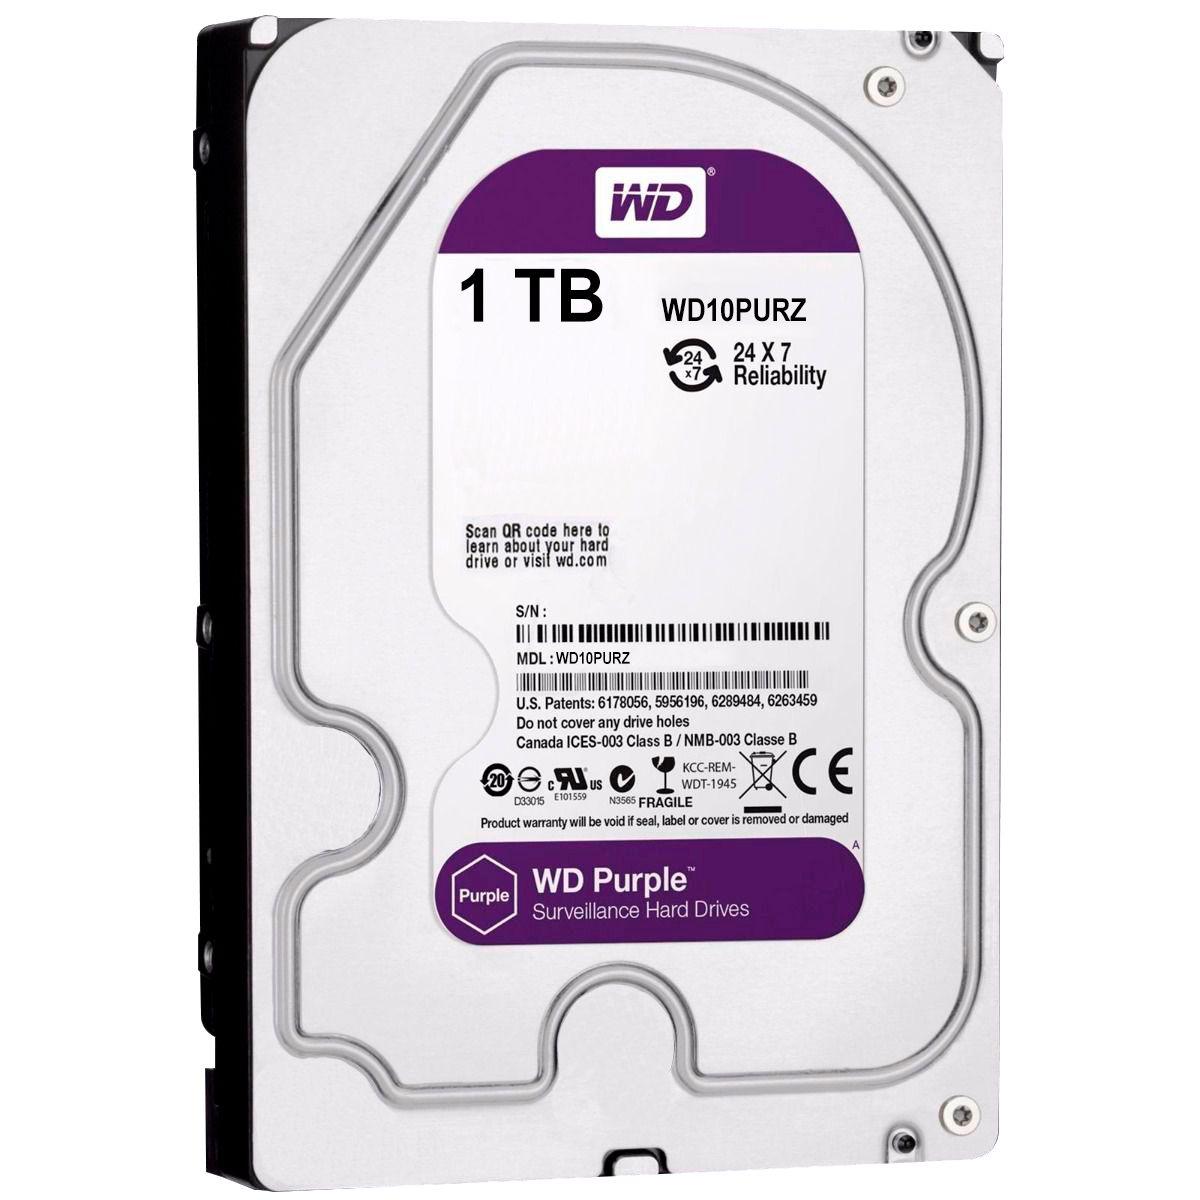 Kit 4 Câmeras de Segurança Full HD 1080p VHD 3230B G4 + DVR Intelbras Full HD + HD WD Purple 1TB + Acessórios  - Tudo Forte